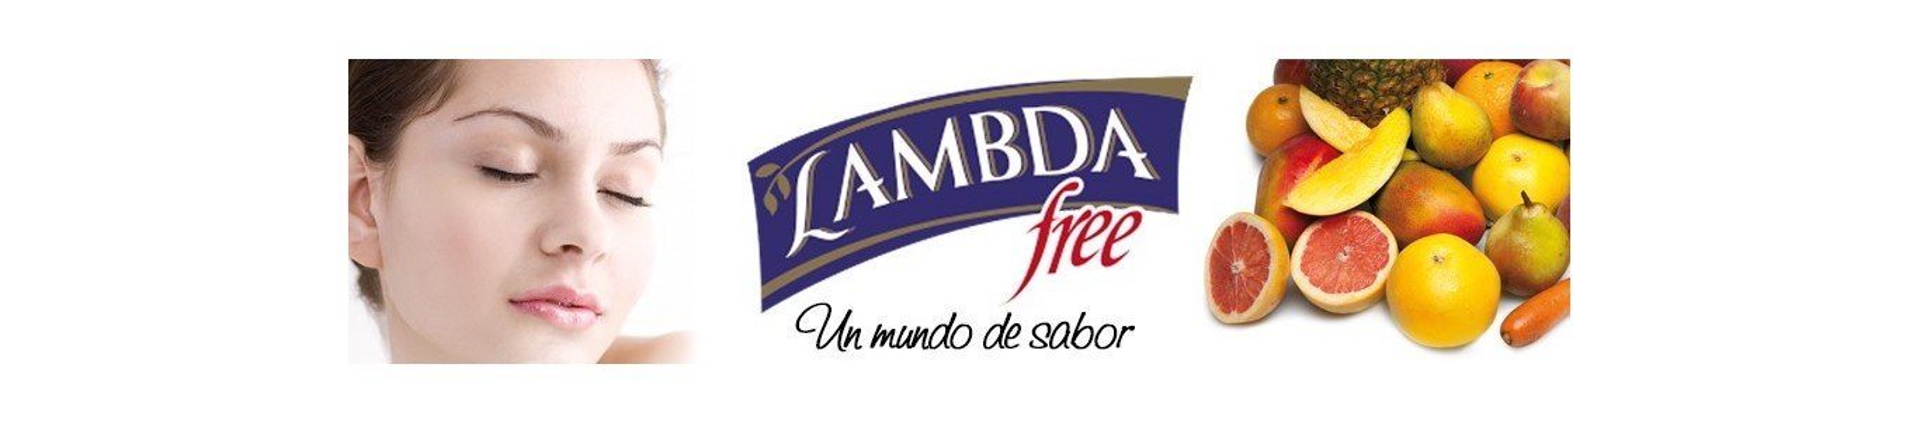 Comprar Zumo sin azúcar - Lambda Free